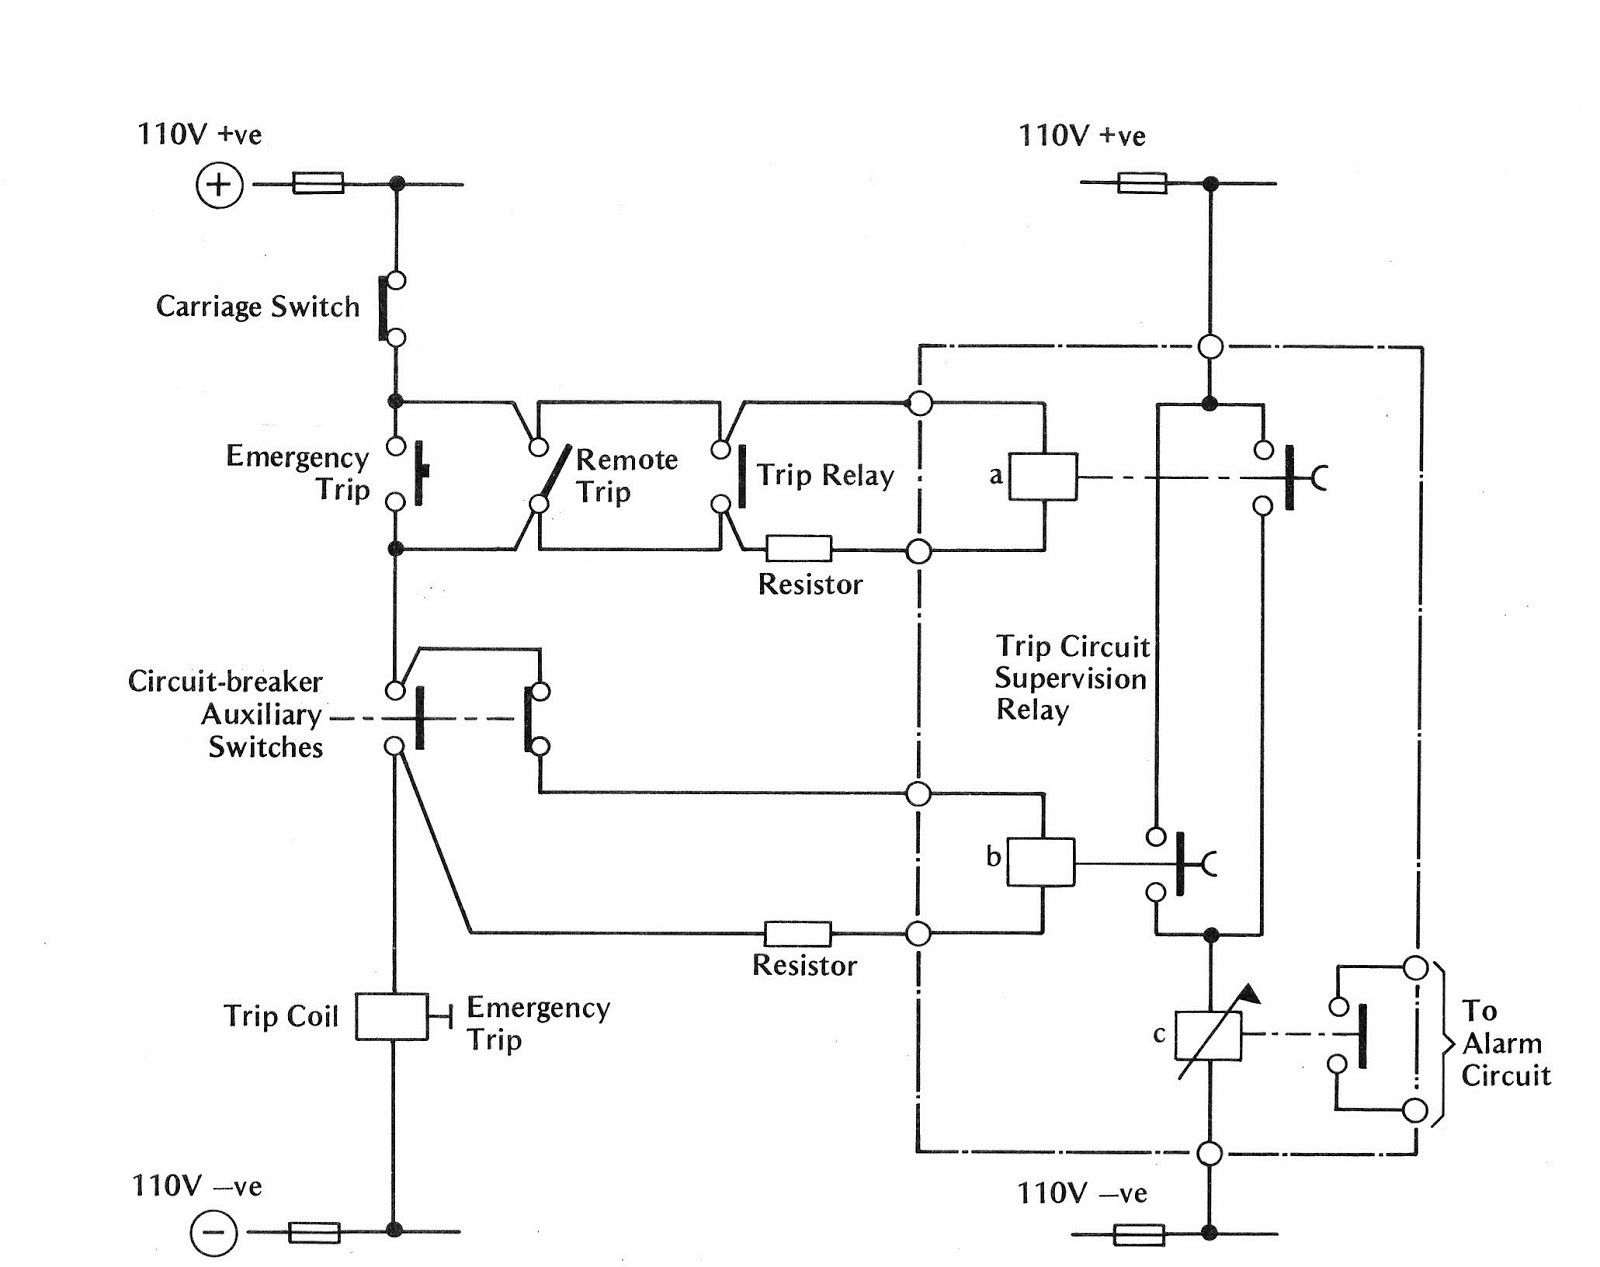 siemens gfci wiring diagram wiring diagram repair guides siemens breaker wiring diagram schema wiring diagramcircuit breaker [ 1600 x 1267 Pixel ]